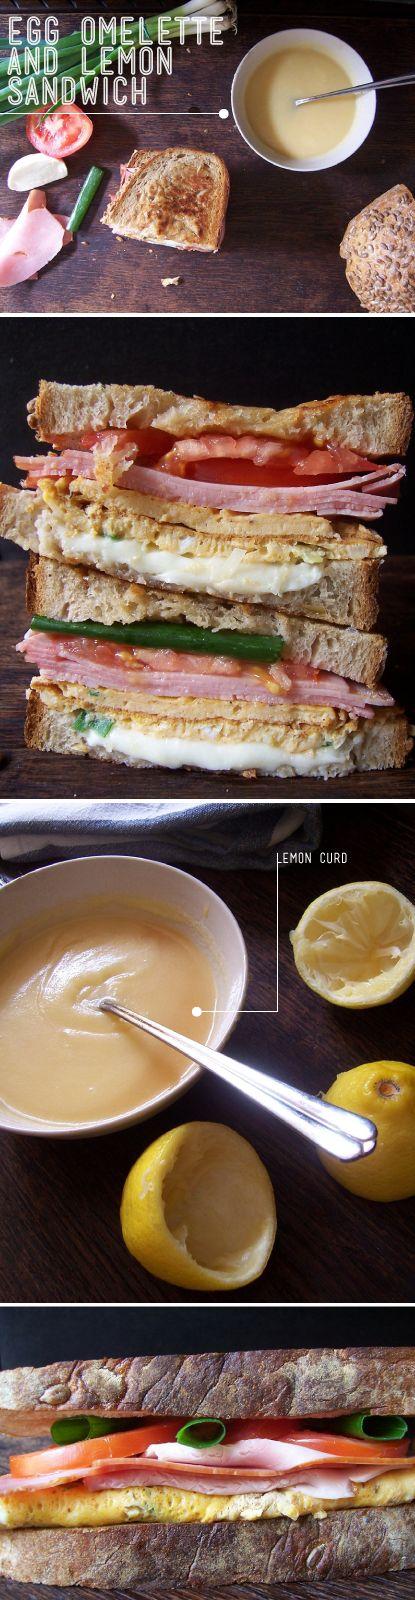 Ham, Mozzarella, Egg Omelette and Lemon Curd Sandwich - oh so good:): Recipes Sauces Oth, Sandwiches Recipes, Sandwich Recipes